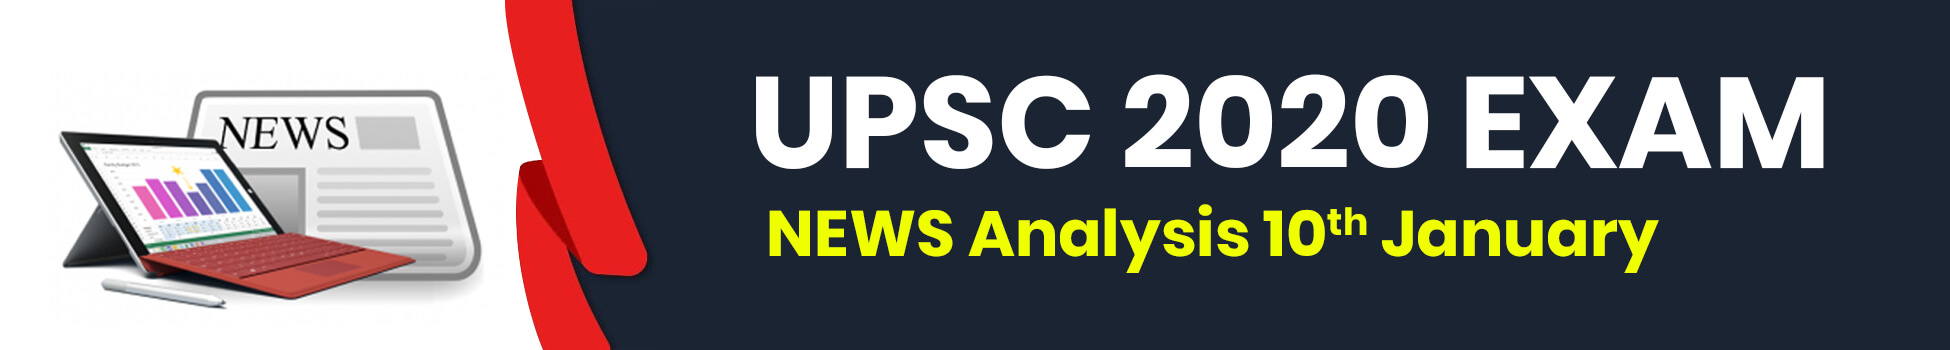 UPSC 2020 Exam - NEWS Analysis 10th January